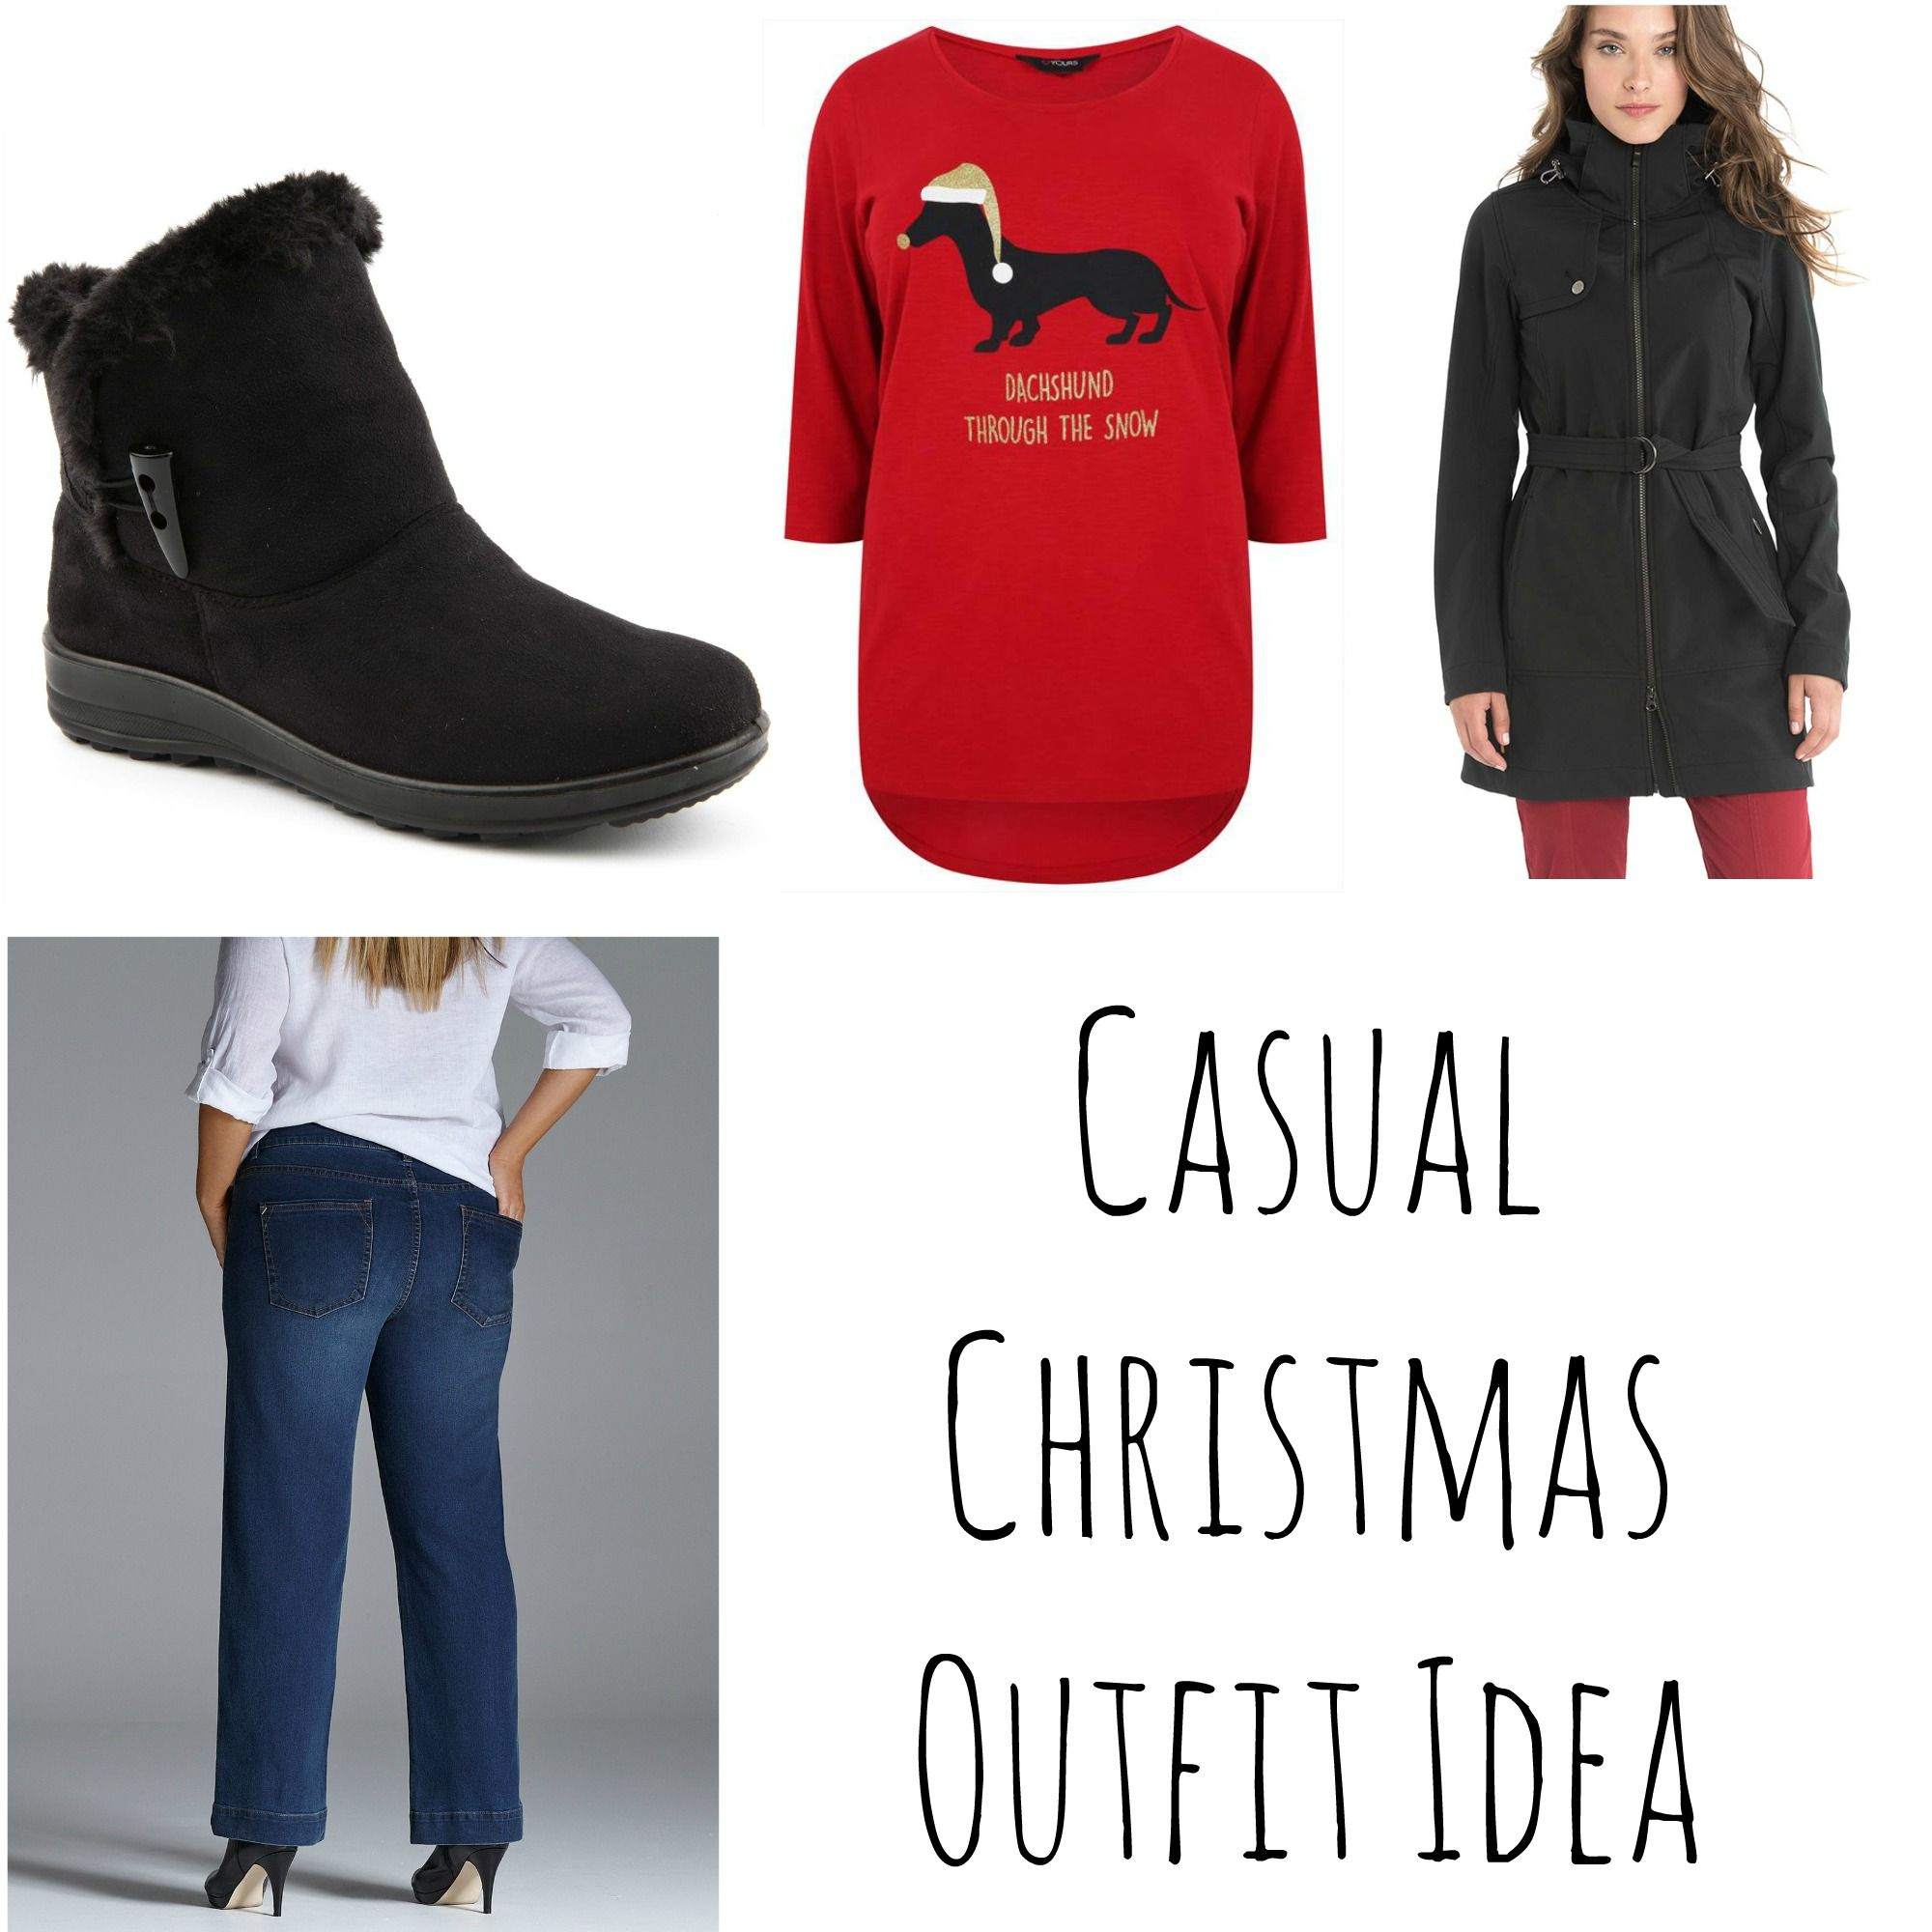 8650308380b Casual Christmas Outfit Idea  fashion  casual  Christmas